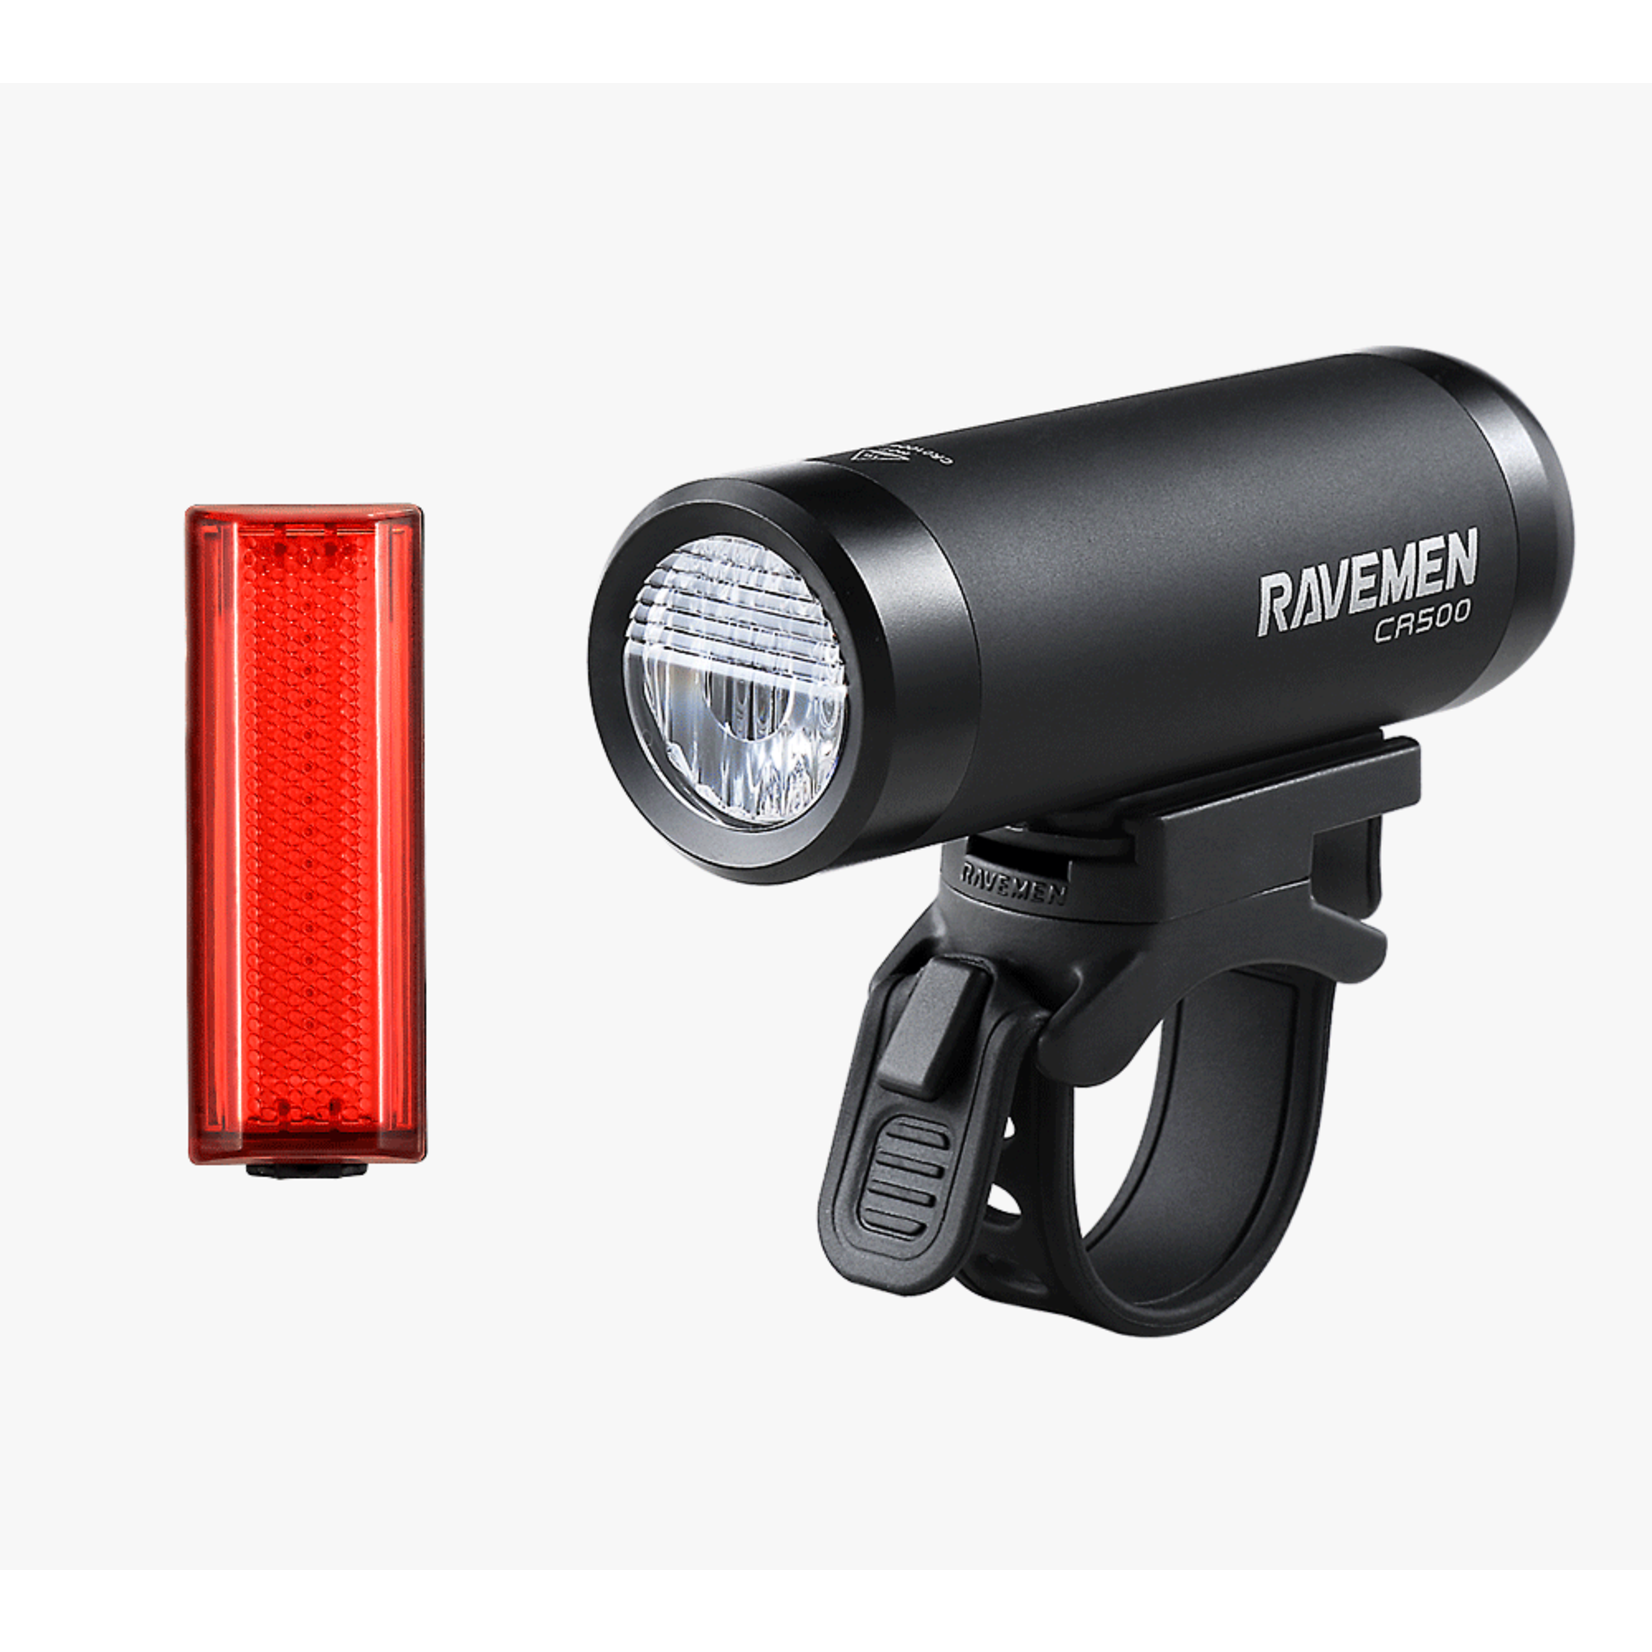 Ravemen RAVEMEN CR500 LIGHT SET